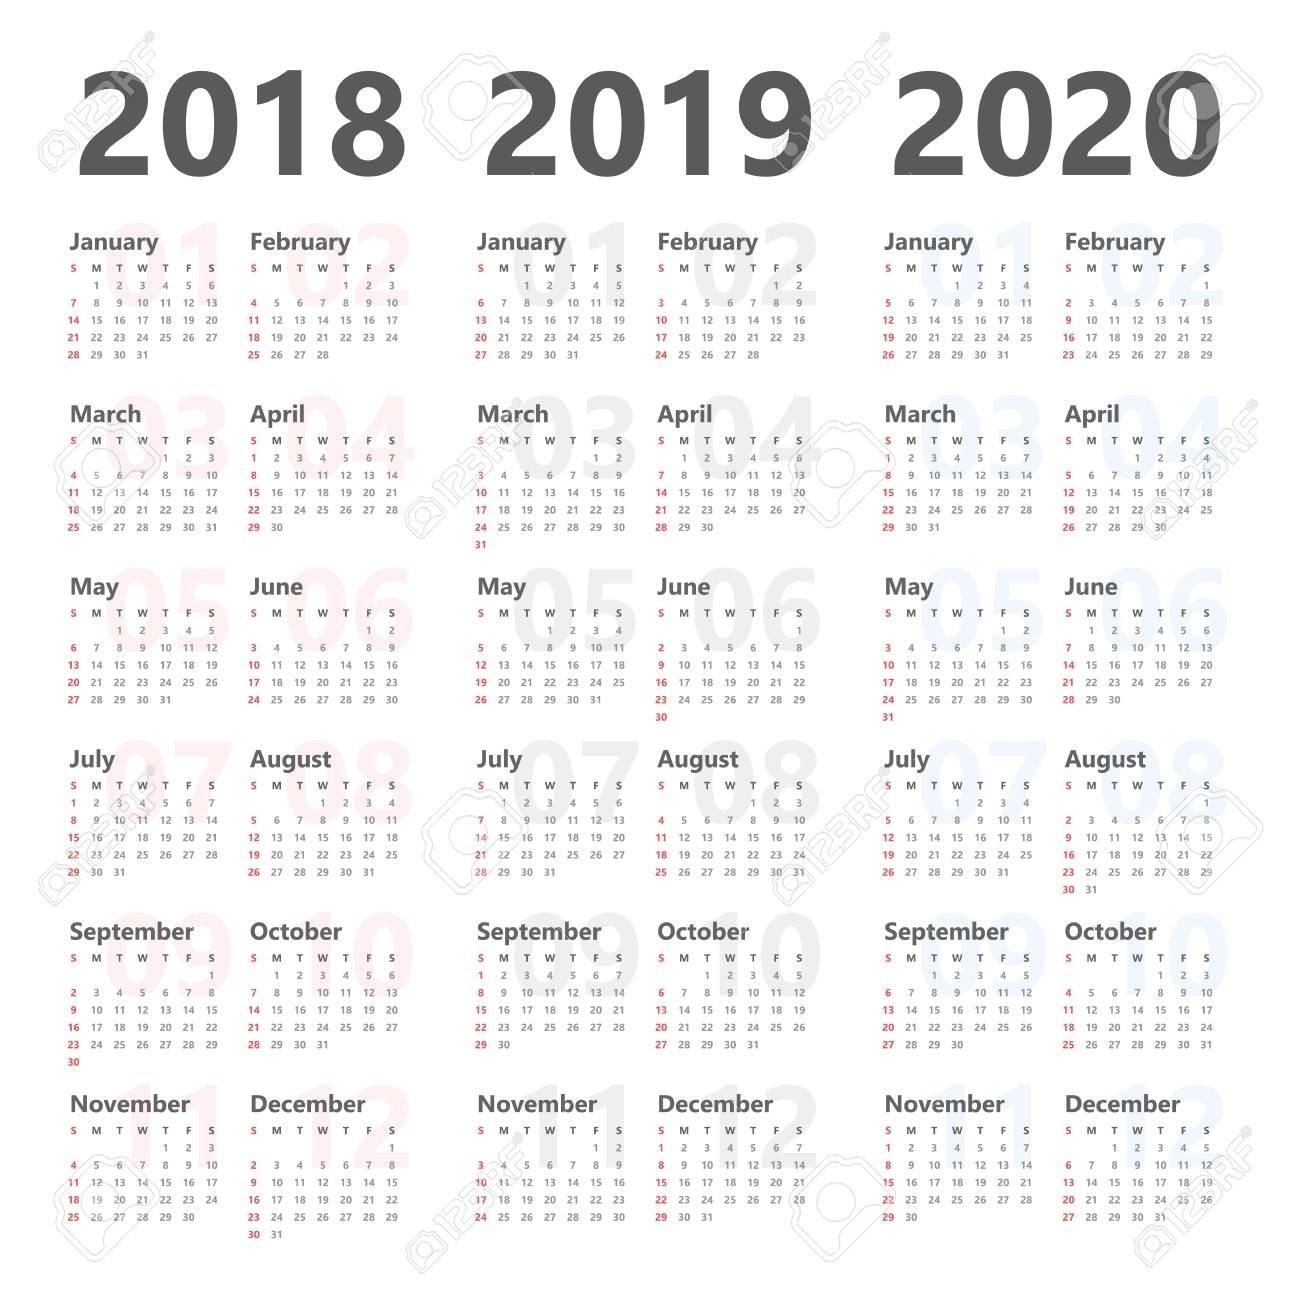 3 Year Calendar Template • Printable Blank Calendar Template-Free Printable 4X6 Calendars 2020 Templates